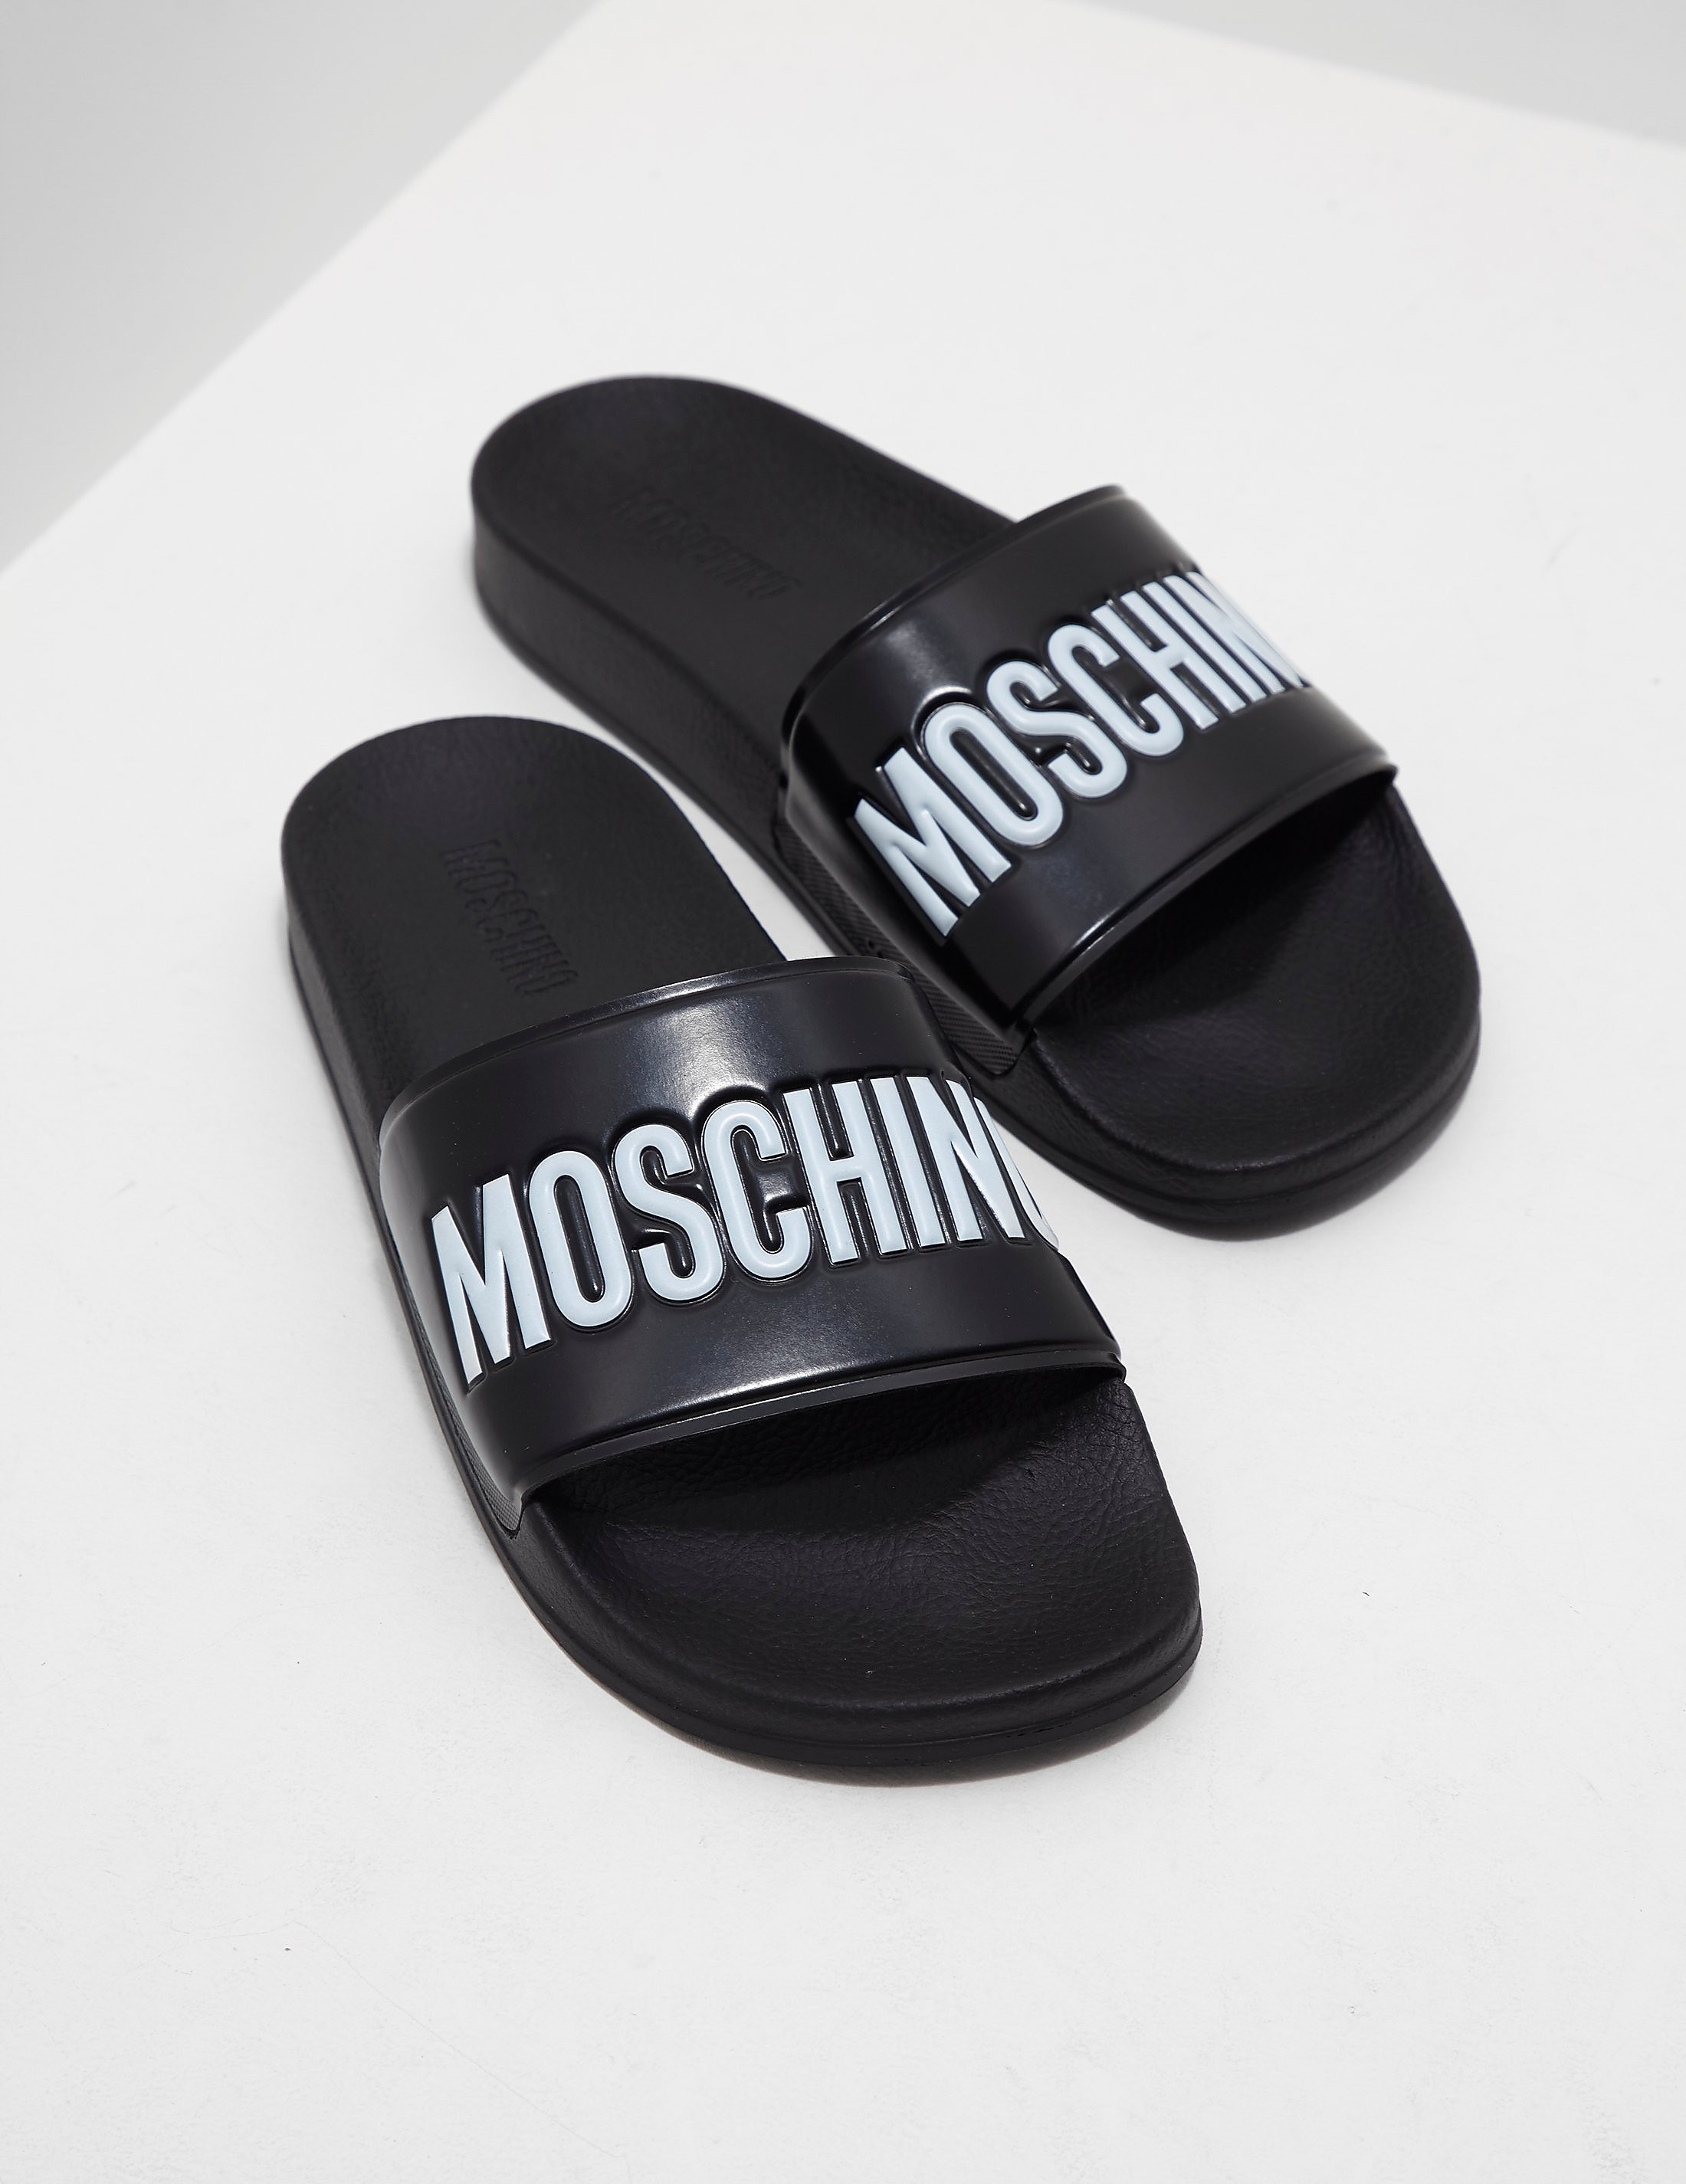 Moschino Print Slides